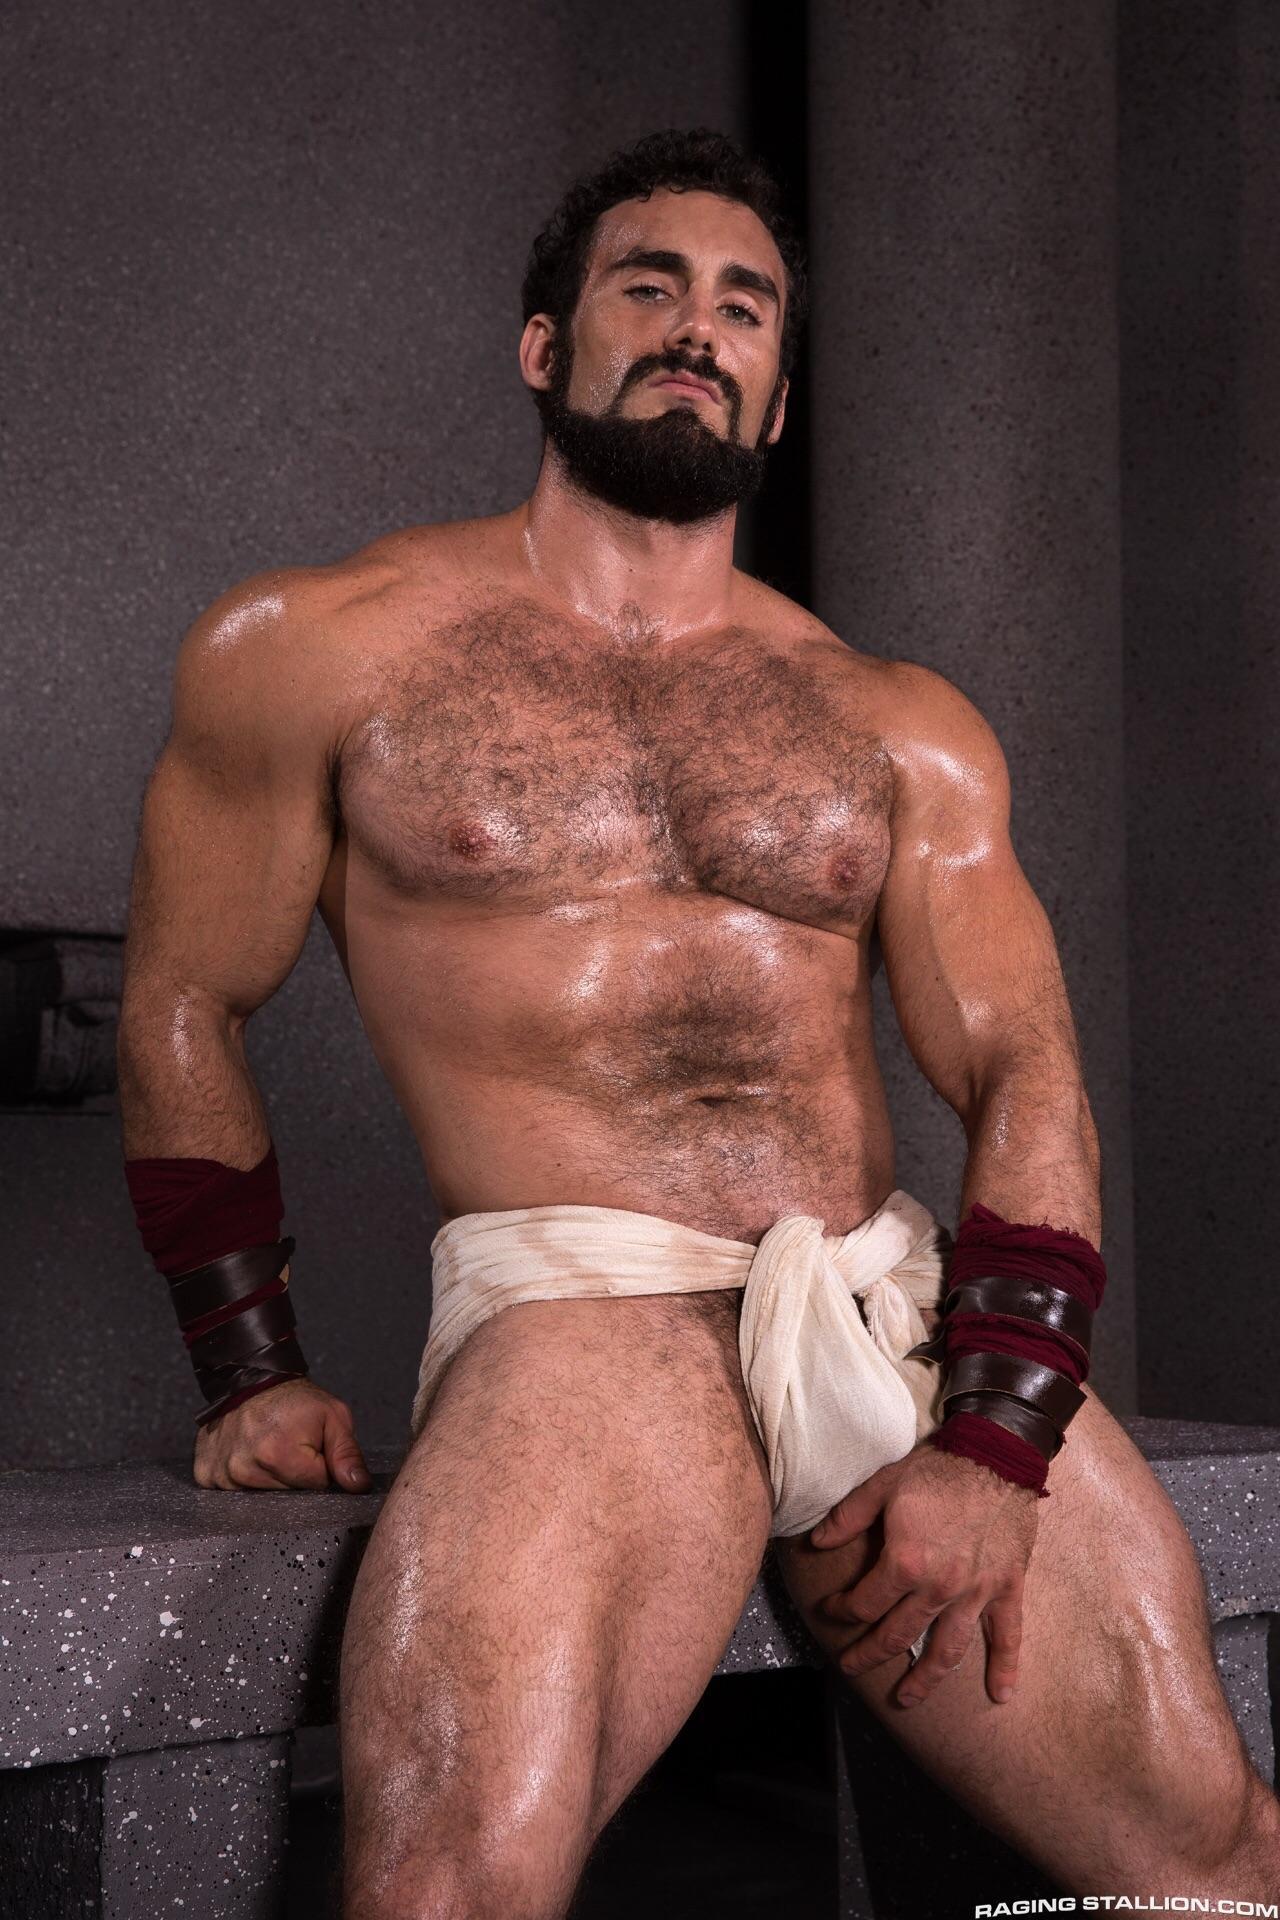 Jaxton Wheeler gay hot daddy dude men porn str8